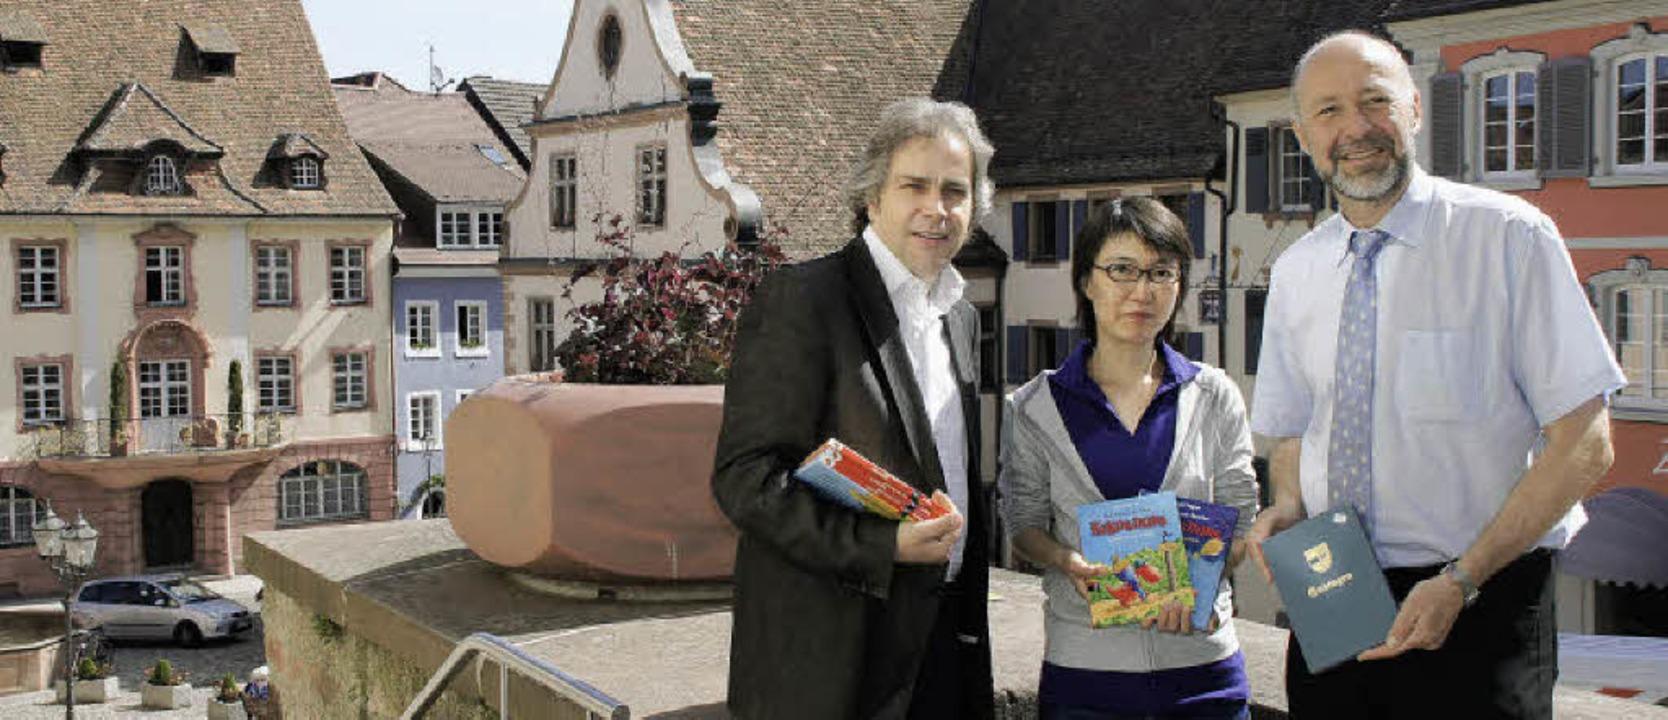 Freuen sich auf den 6. Endinger Bücher...d Bürgermeister Hans-Joachim Schwarz.   | Foto: Ilona Hüge